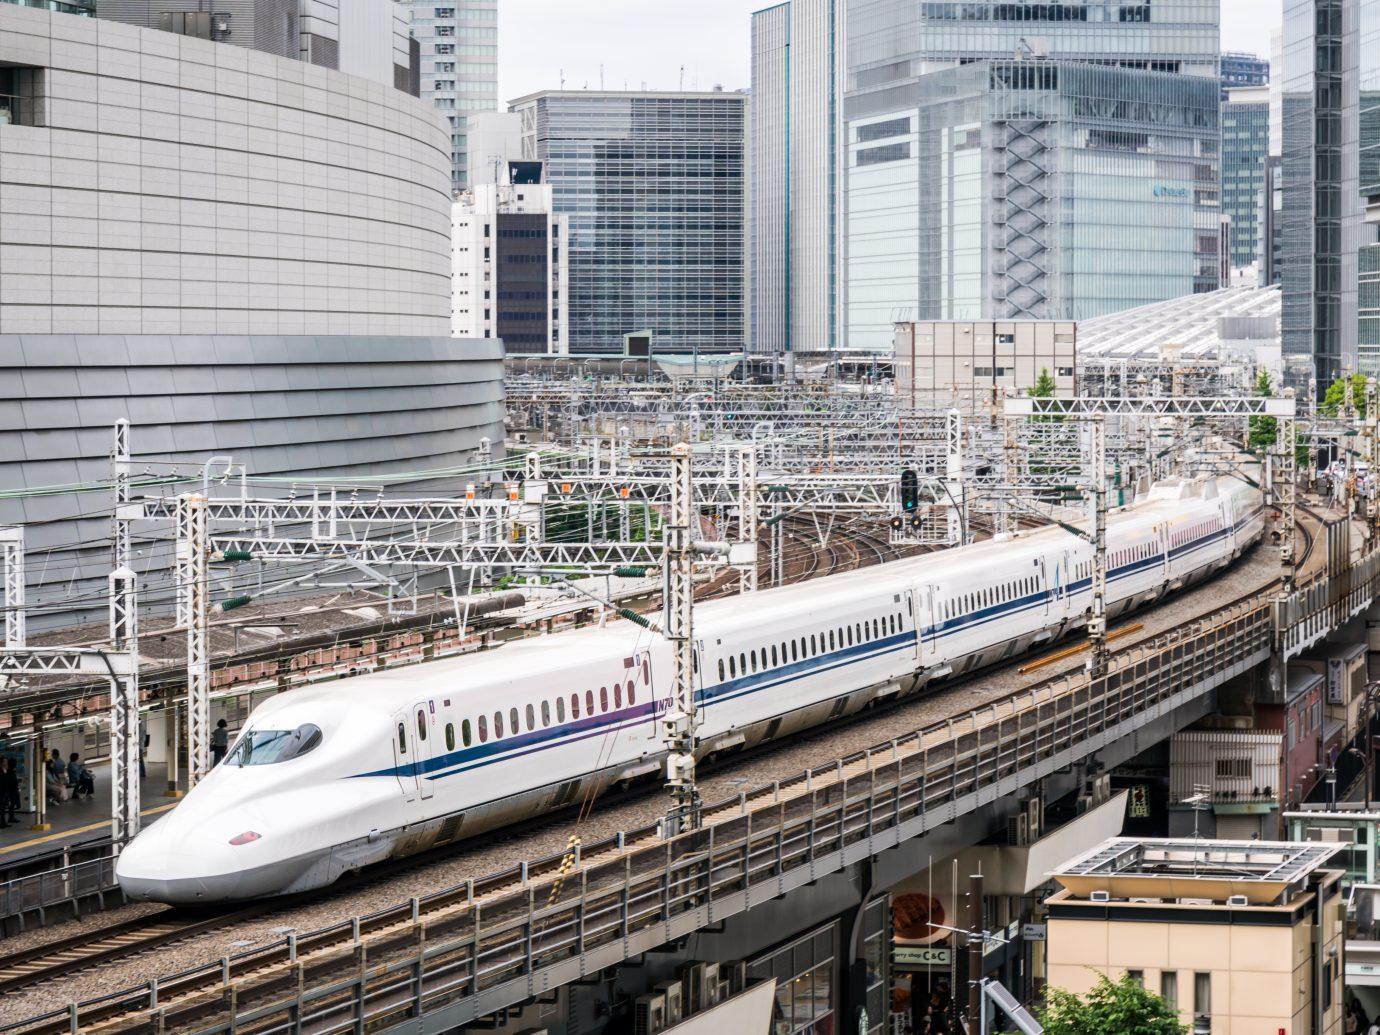 Tokyo, Japan - May 14, 2017: High angle view of a Tokaido Shinkansen bullet train speeding through downtown Tokyo.